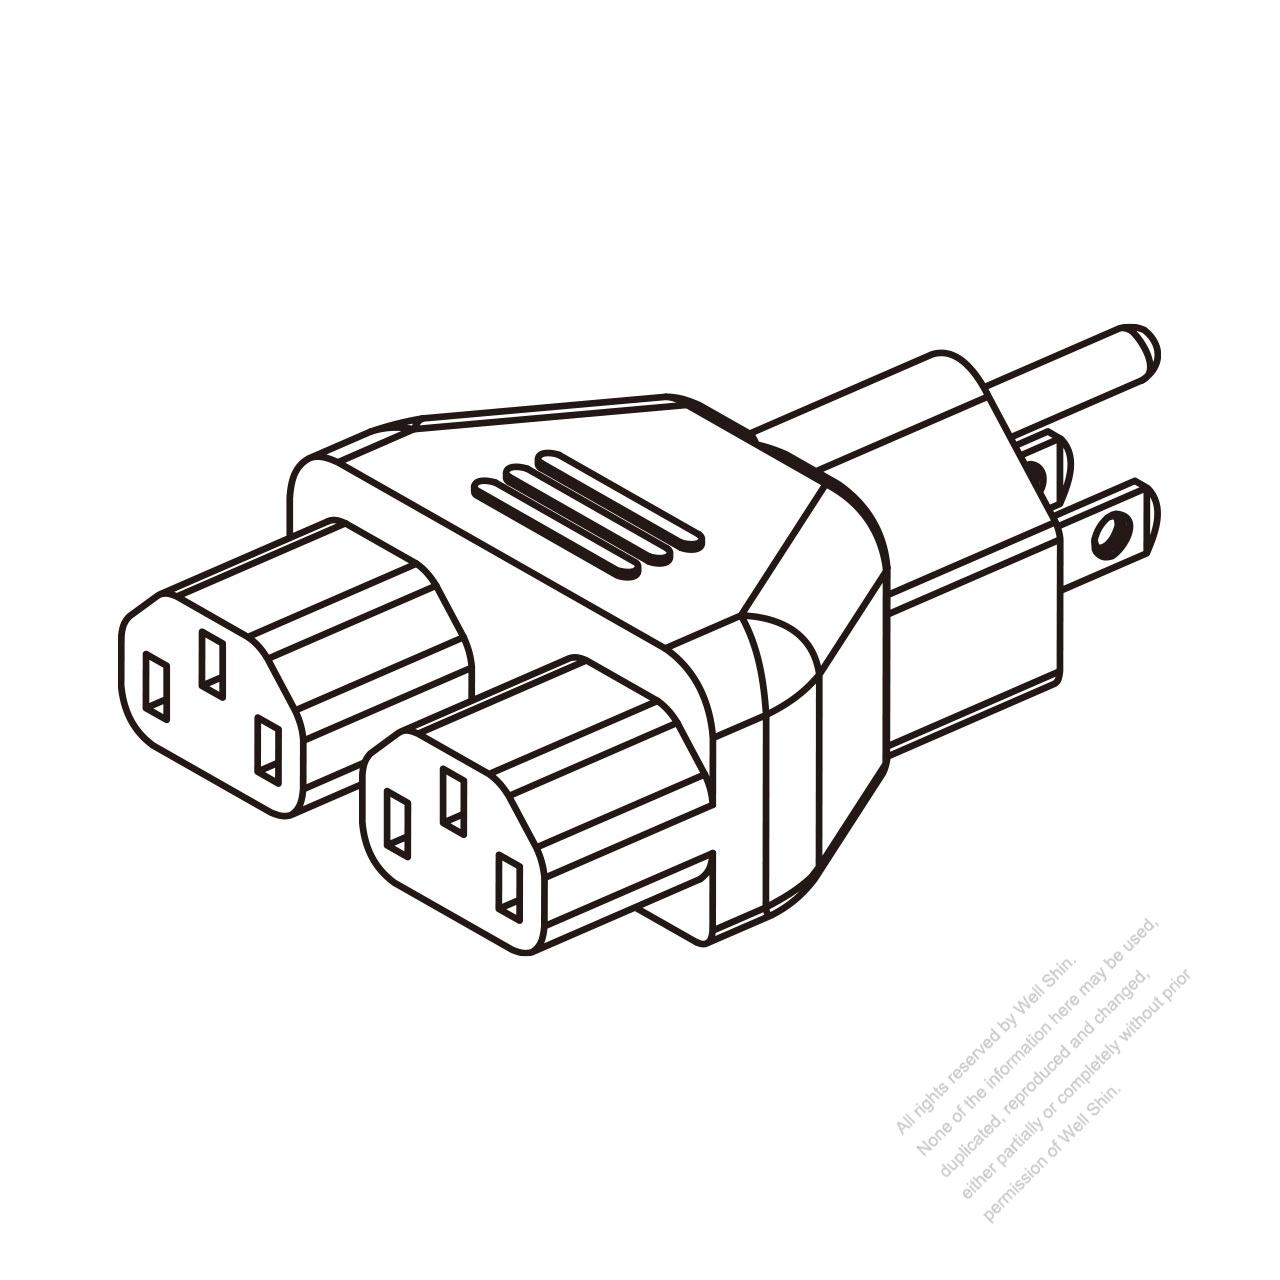 Adapter Plug Nema 5 15p To Iec 320 C13 X 2 3 To 3 Pin